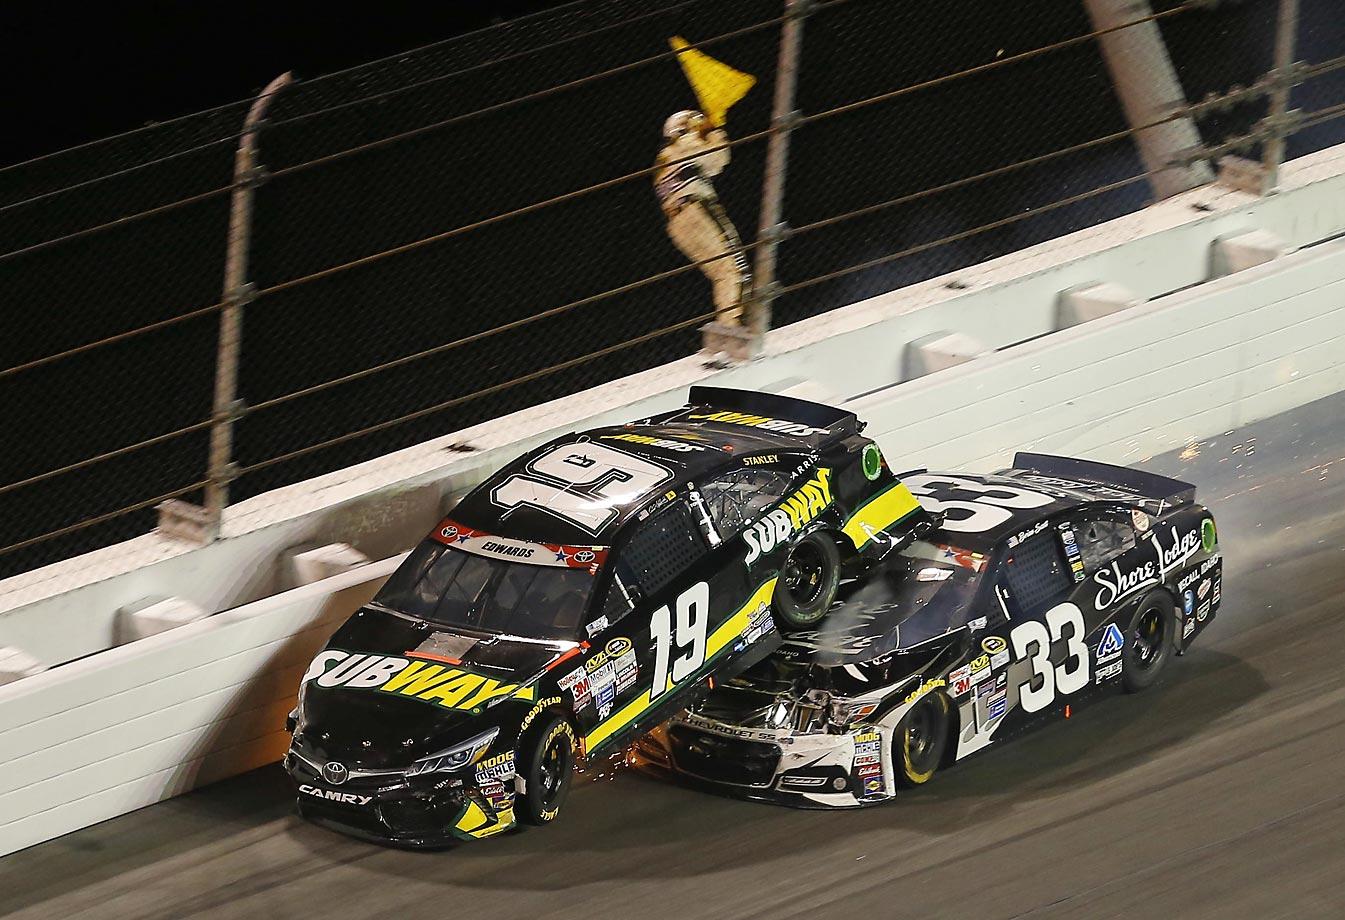 Brian Scott gives Carl Edwards a piggy back during Sunday's race at Daytona.